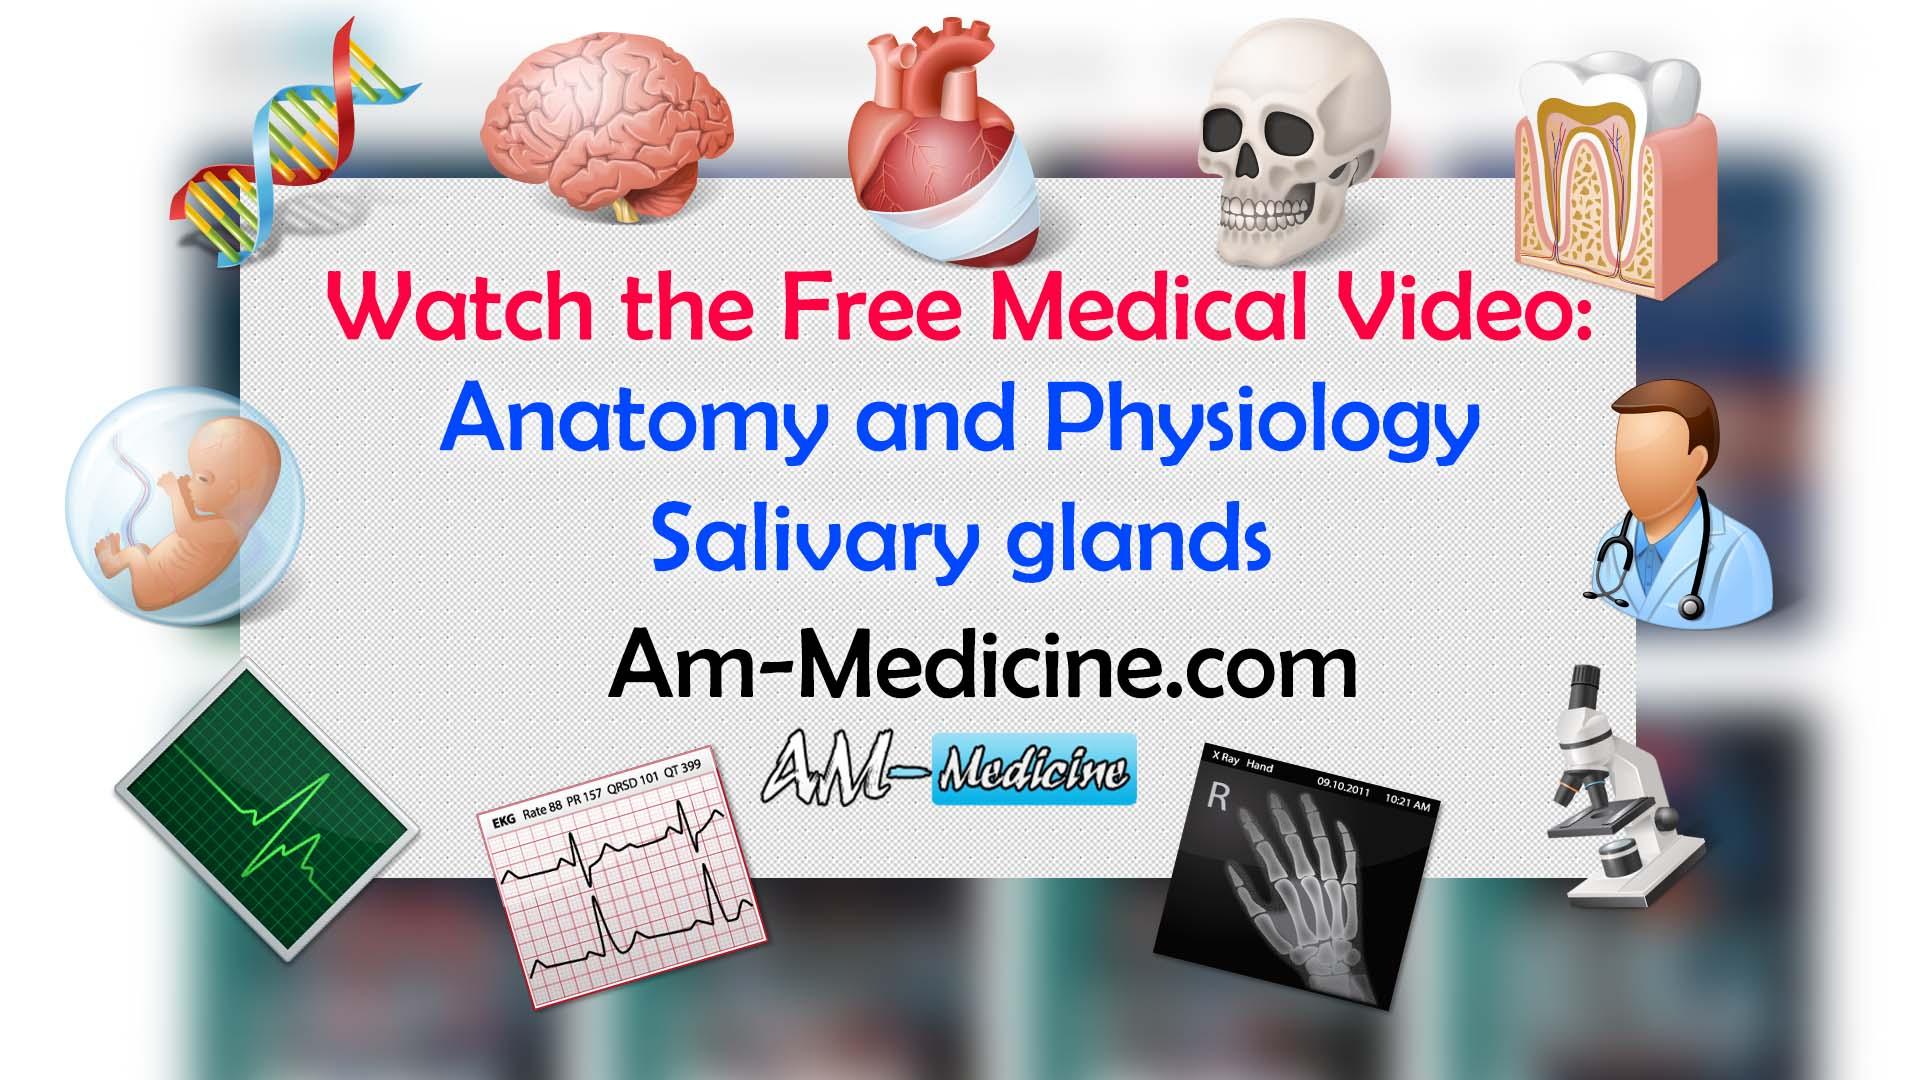 https://pickpdfs.com/anatomy-and-physiology-salivary-glands-video/